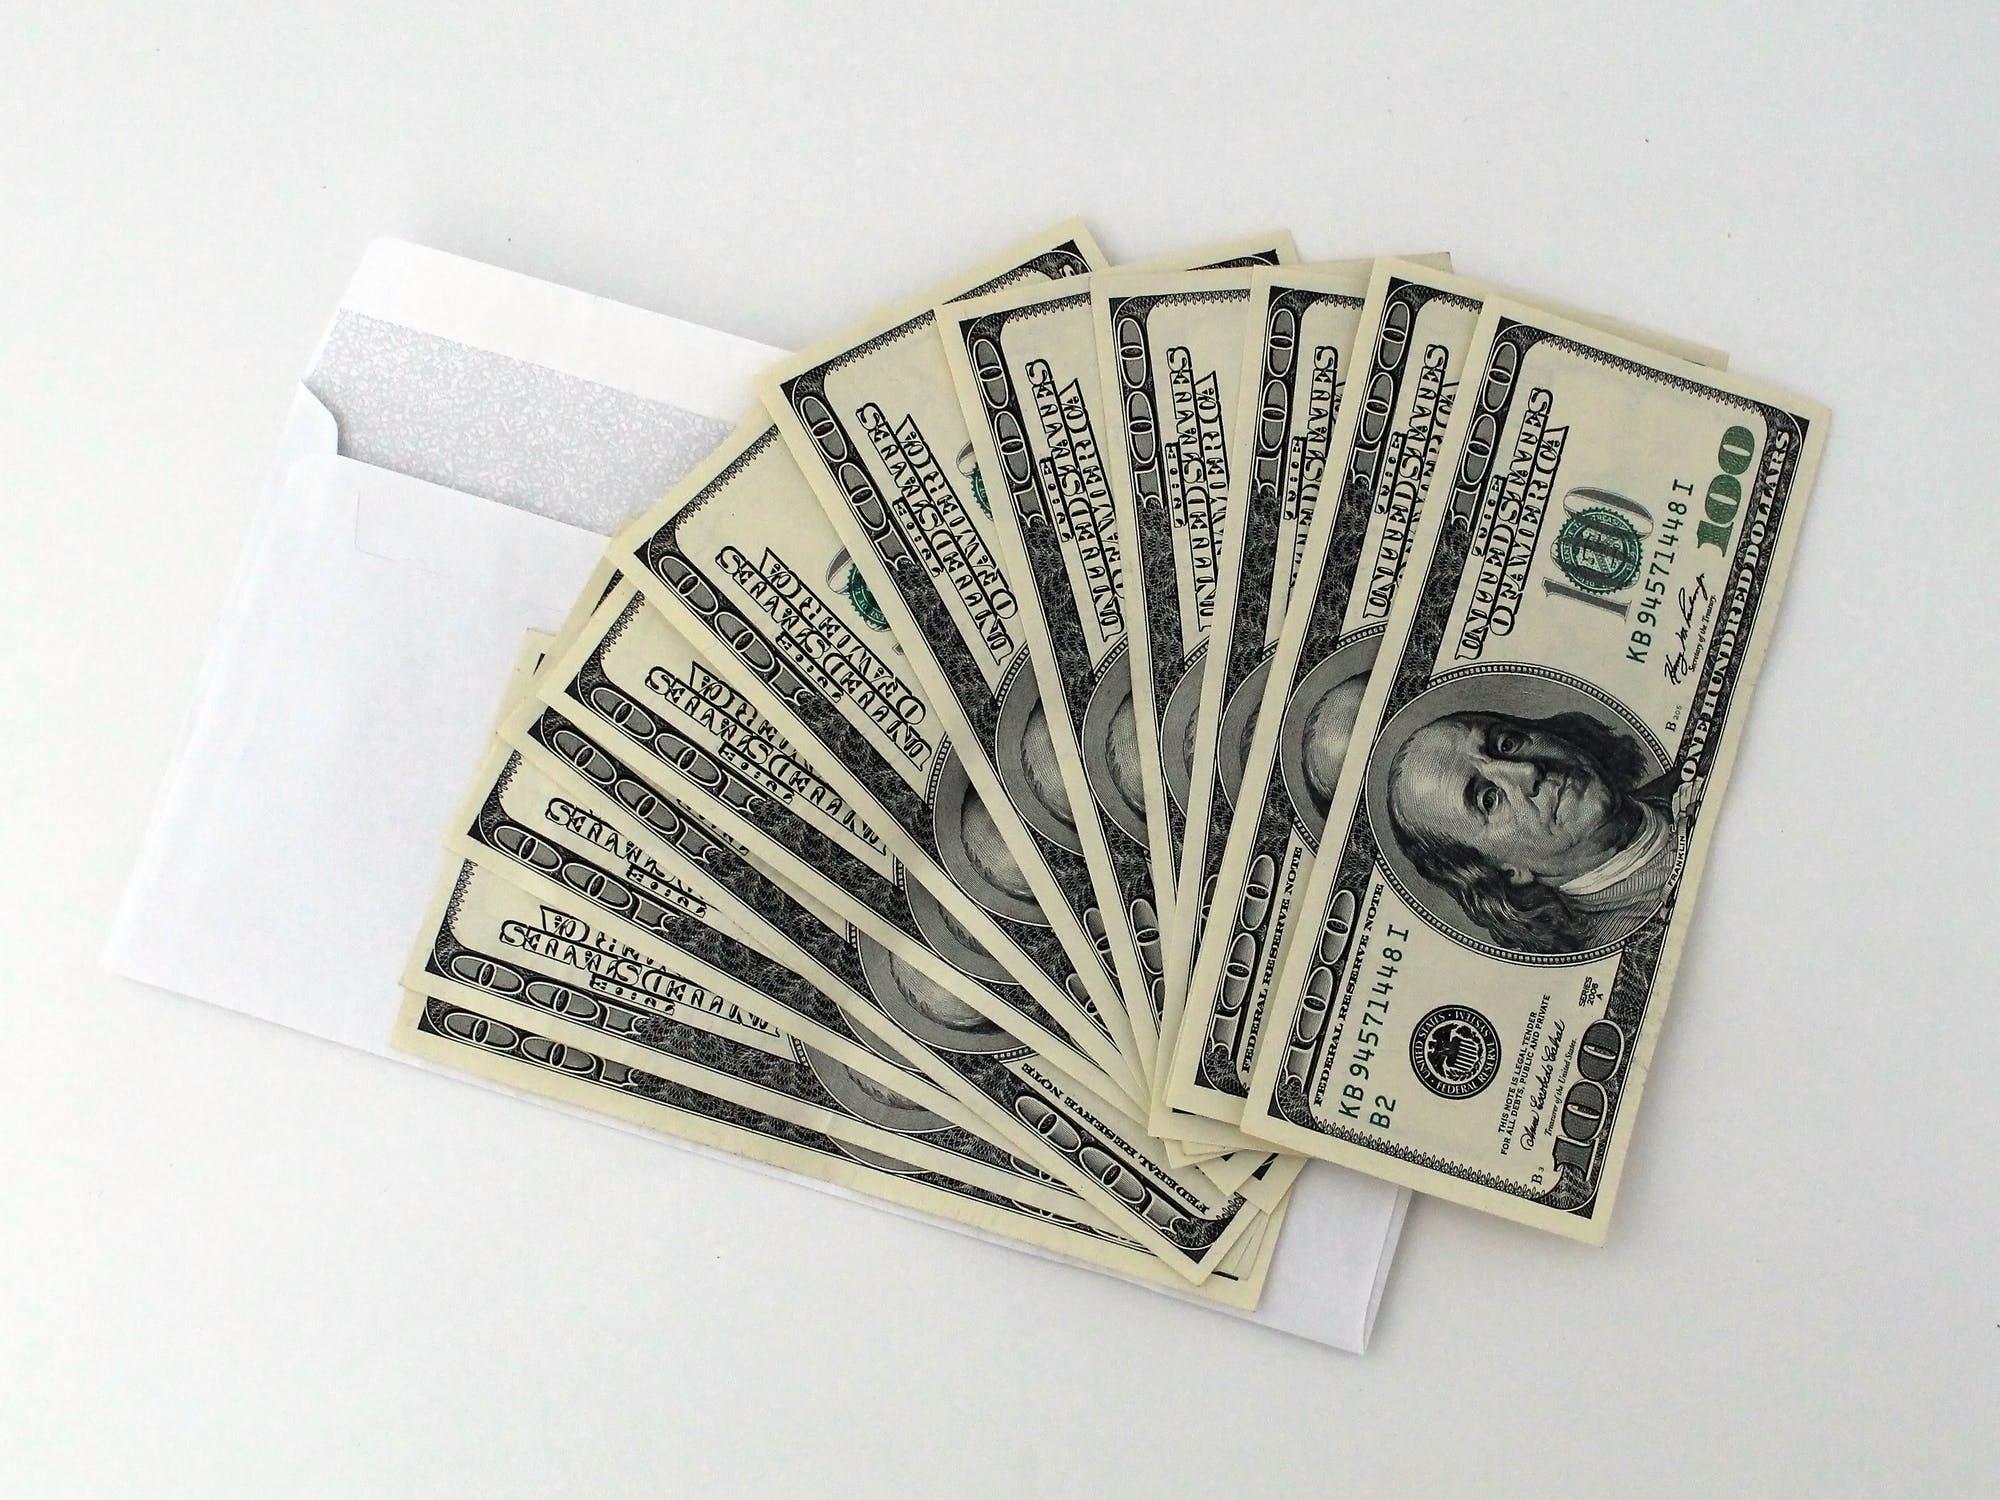 Investing: From Hobby to Money Making Side Gig - horsepigcow com